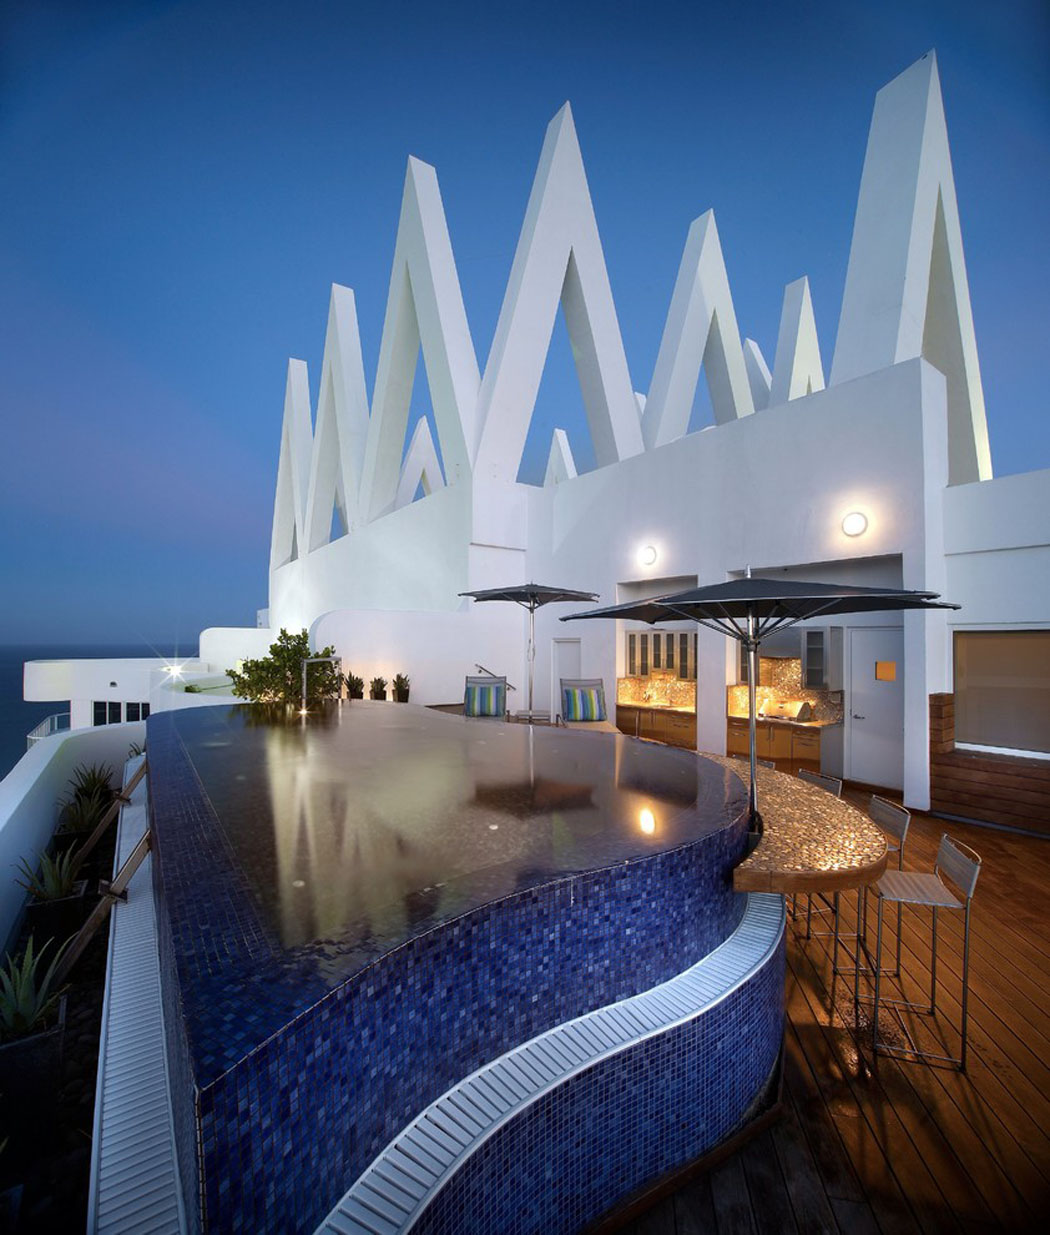 Belle r sidence de vacances miami beach au design - Villa de luxe vacances miami j design ...